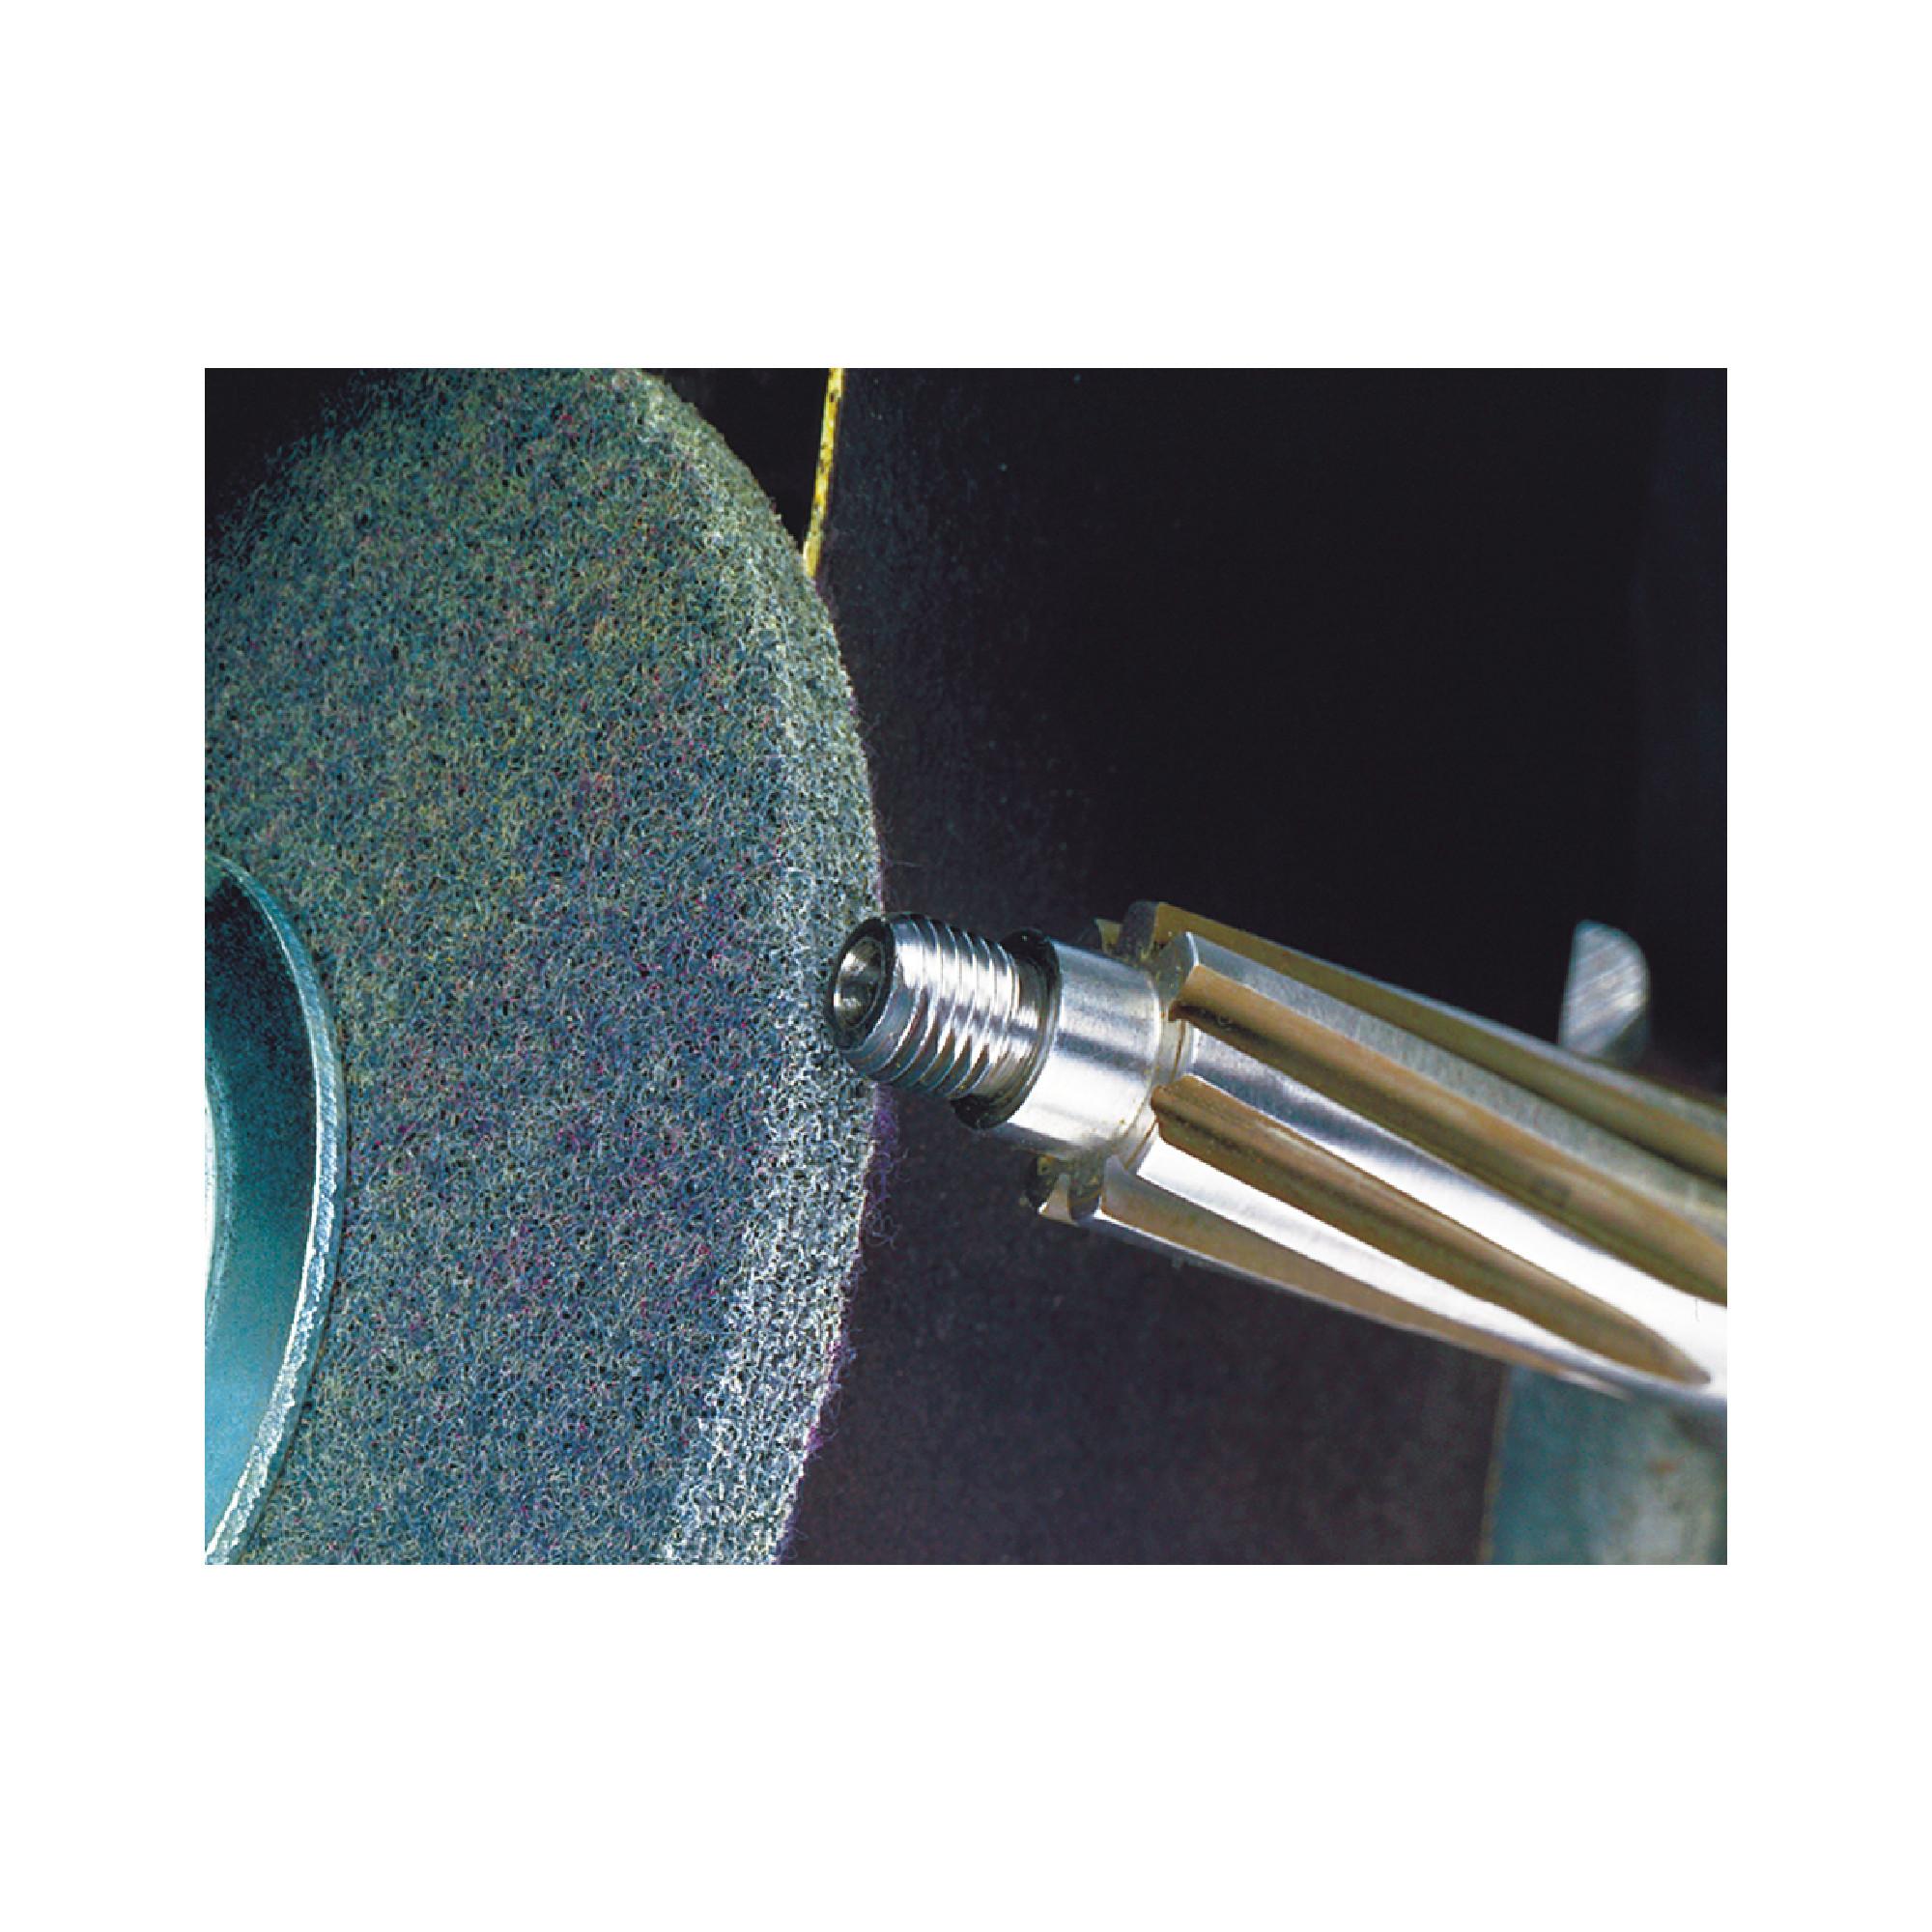 Scotch-Brite™ Cut & Polished Unitized Deburring & Finishing Wheel (CP-UW)